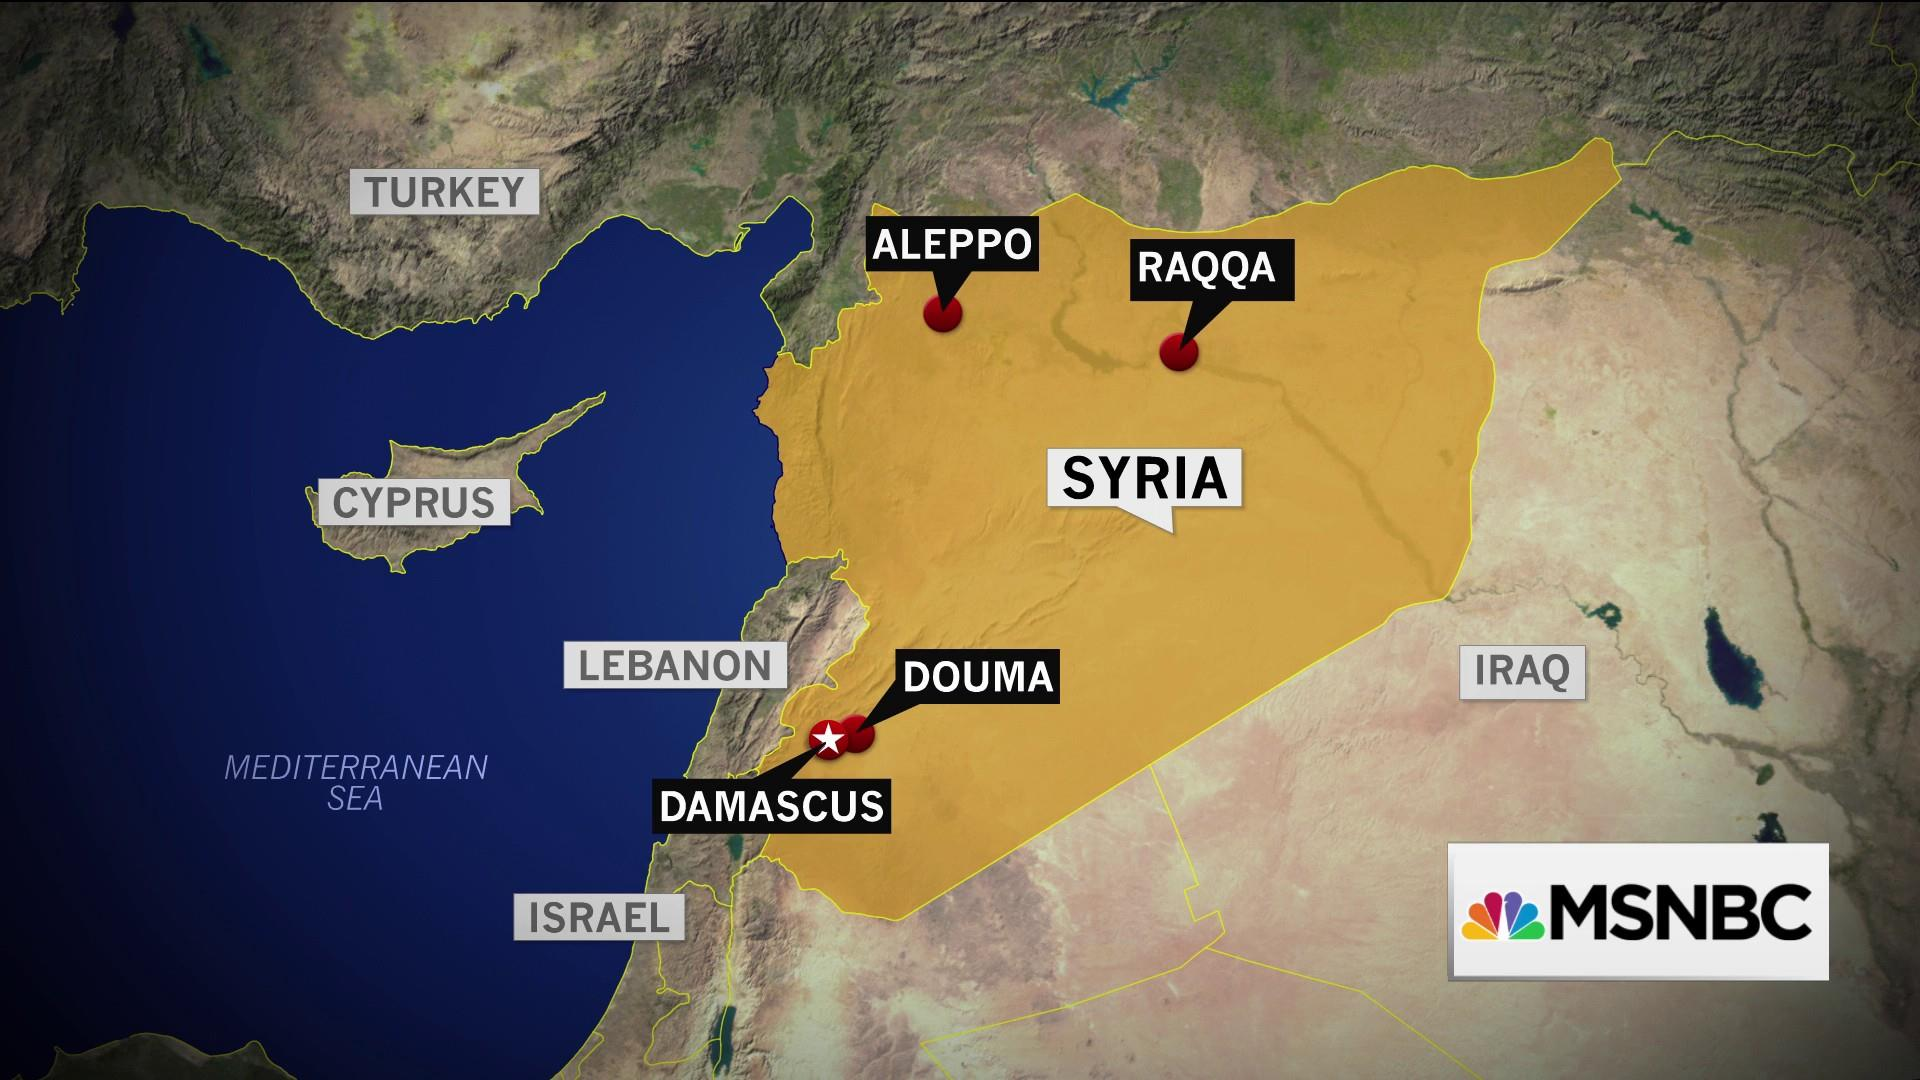 Expert tells Joy Reid 'in a sense, Assad has won this war'